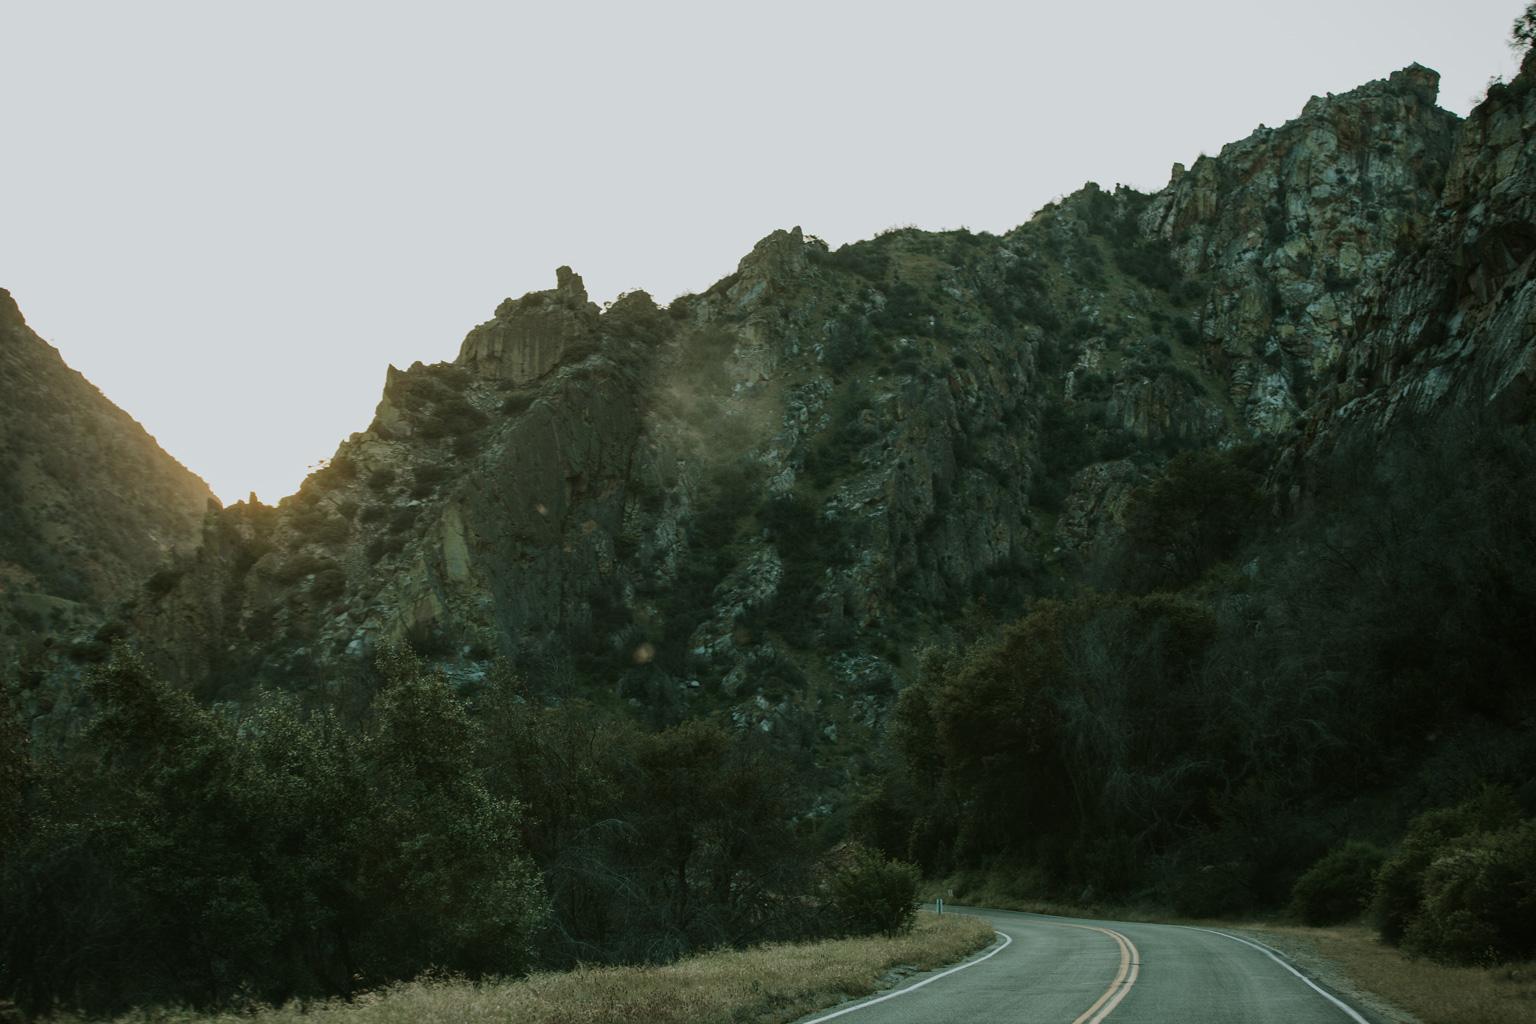 CindyGiovagnoli_Sequoia_KingsCanyon_National_Park_California_roadtrip_travel-006.jpg